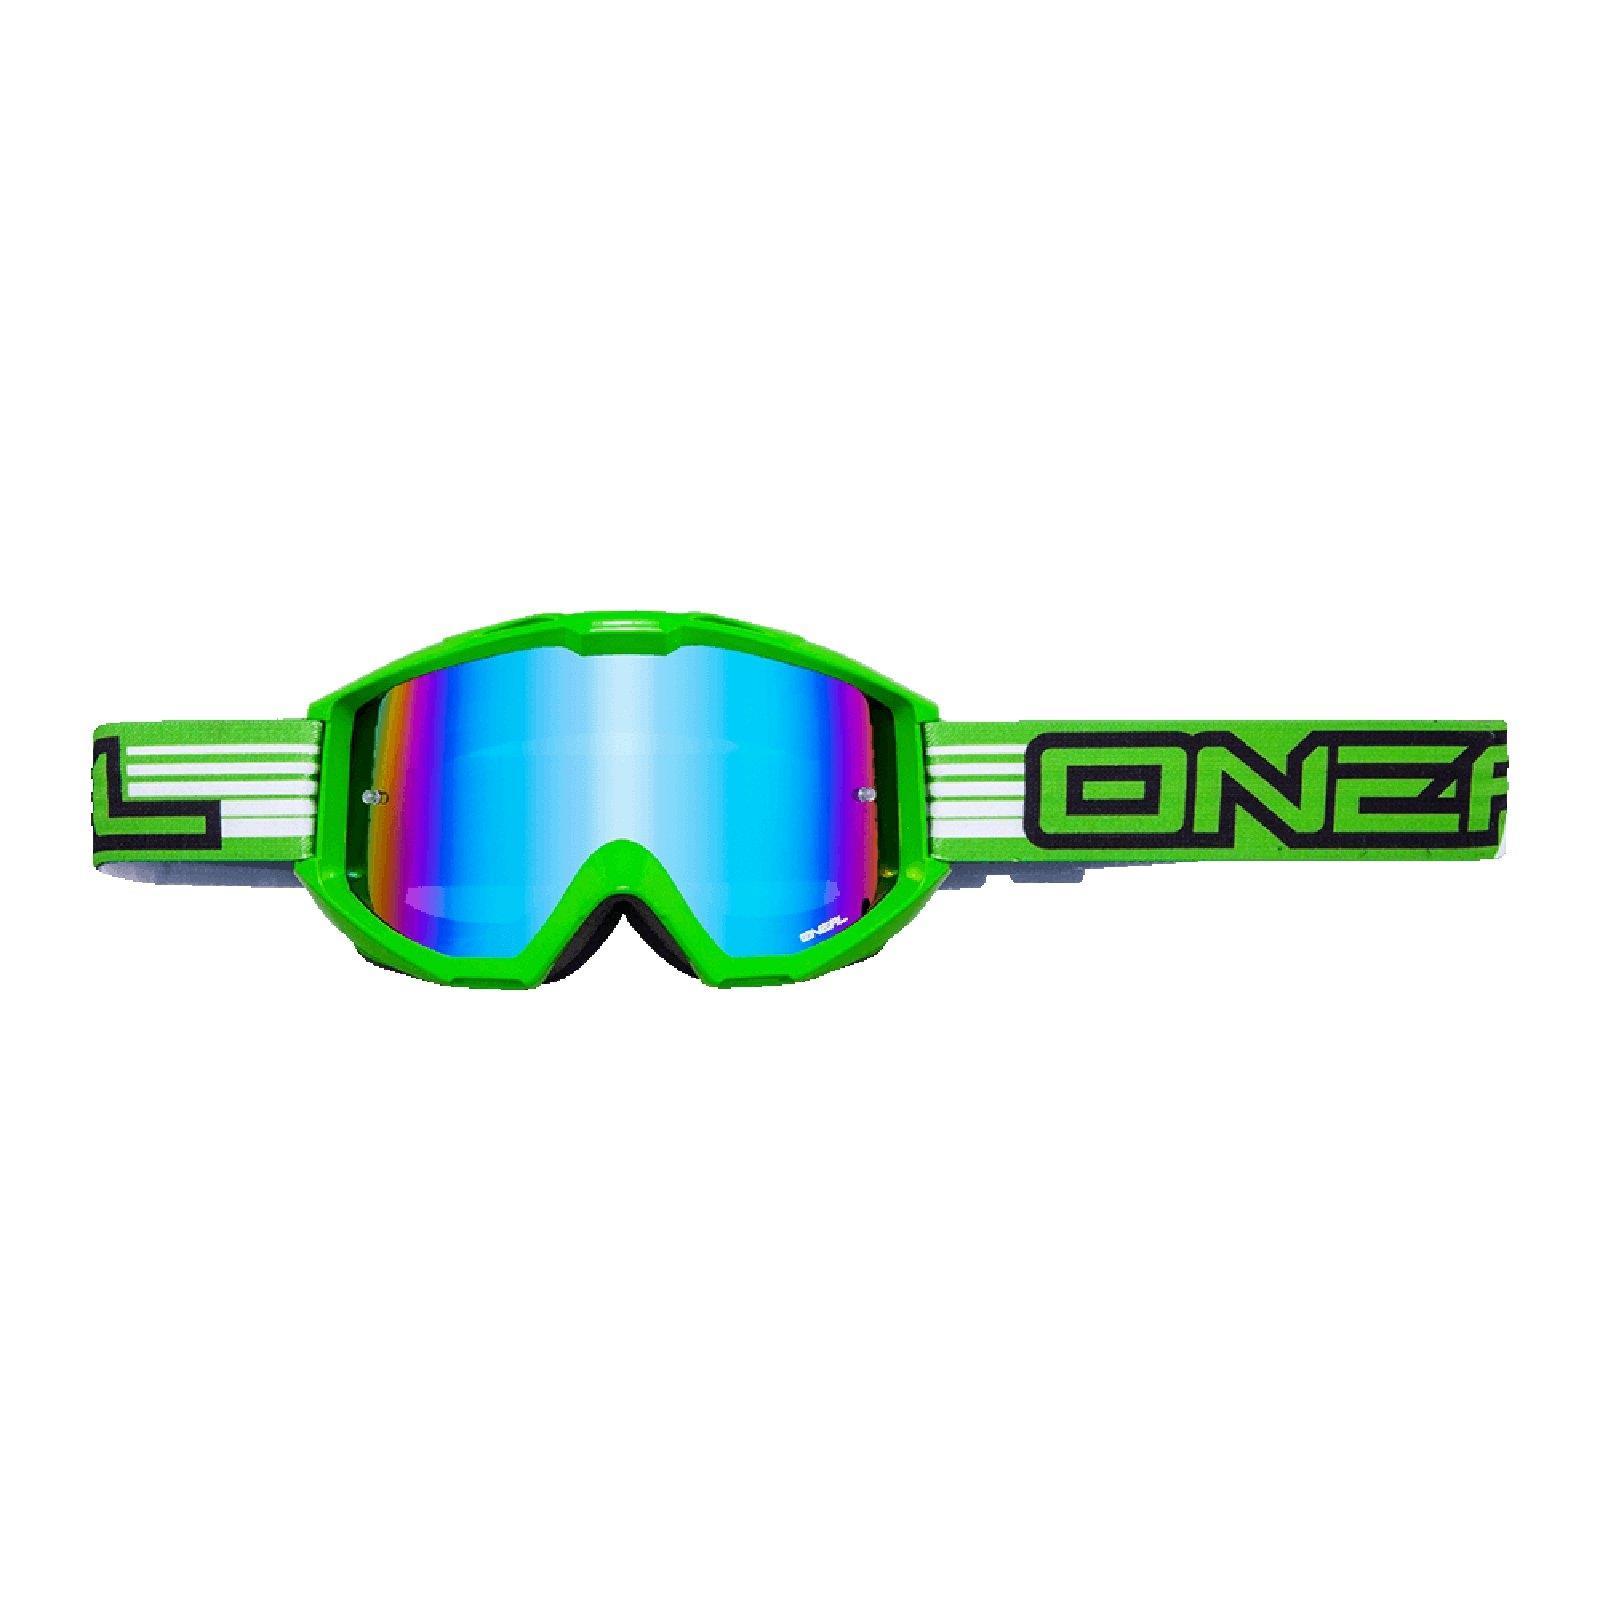 ONeal B-Flex Goggle verspiegelt Gelb MX DH Enduro Moto Cross Brille MTB Freeride